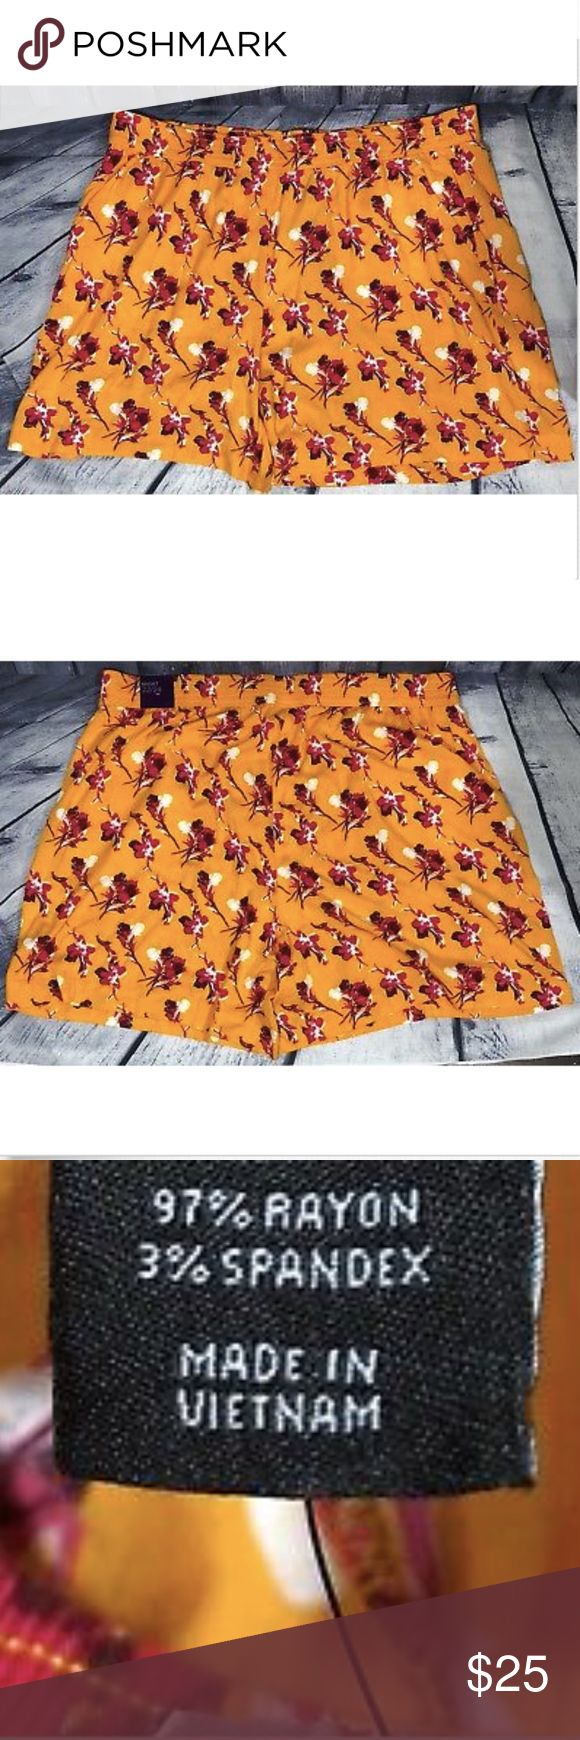 Lane Bryant Orange Pink Stretchy Shorts Elastic Lane Bryant Women's Orange Pink Stretchy Shorts Elastic Waist  Brand New With Tags Lane Bryant Shorts